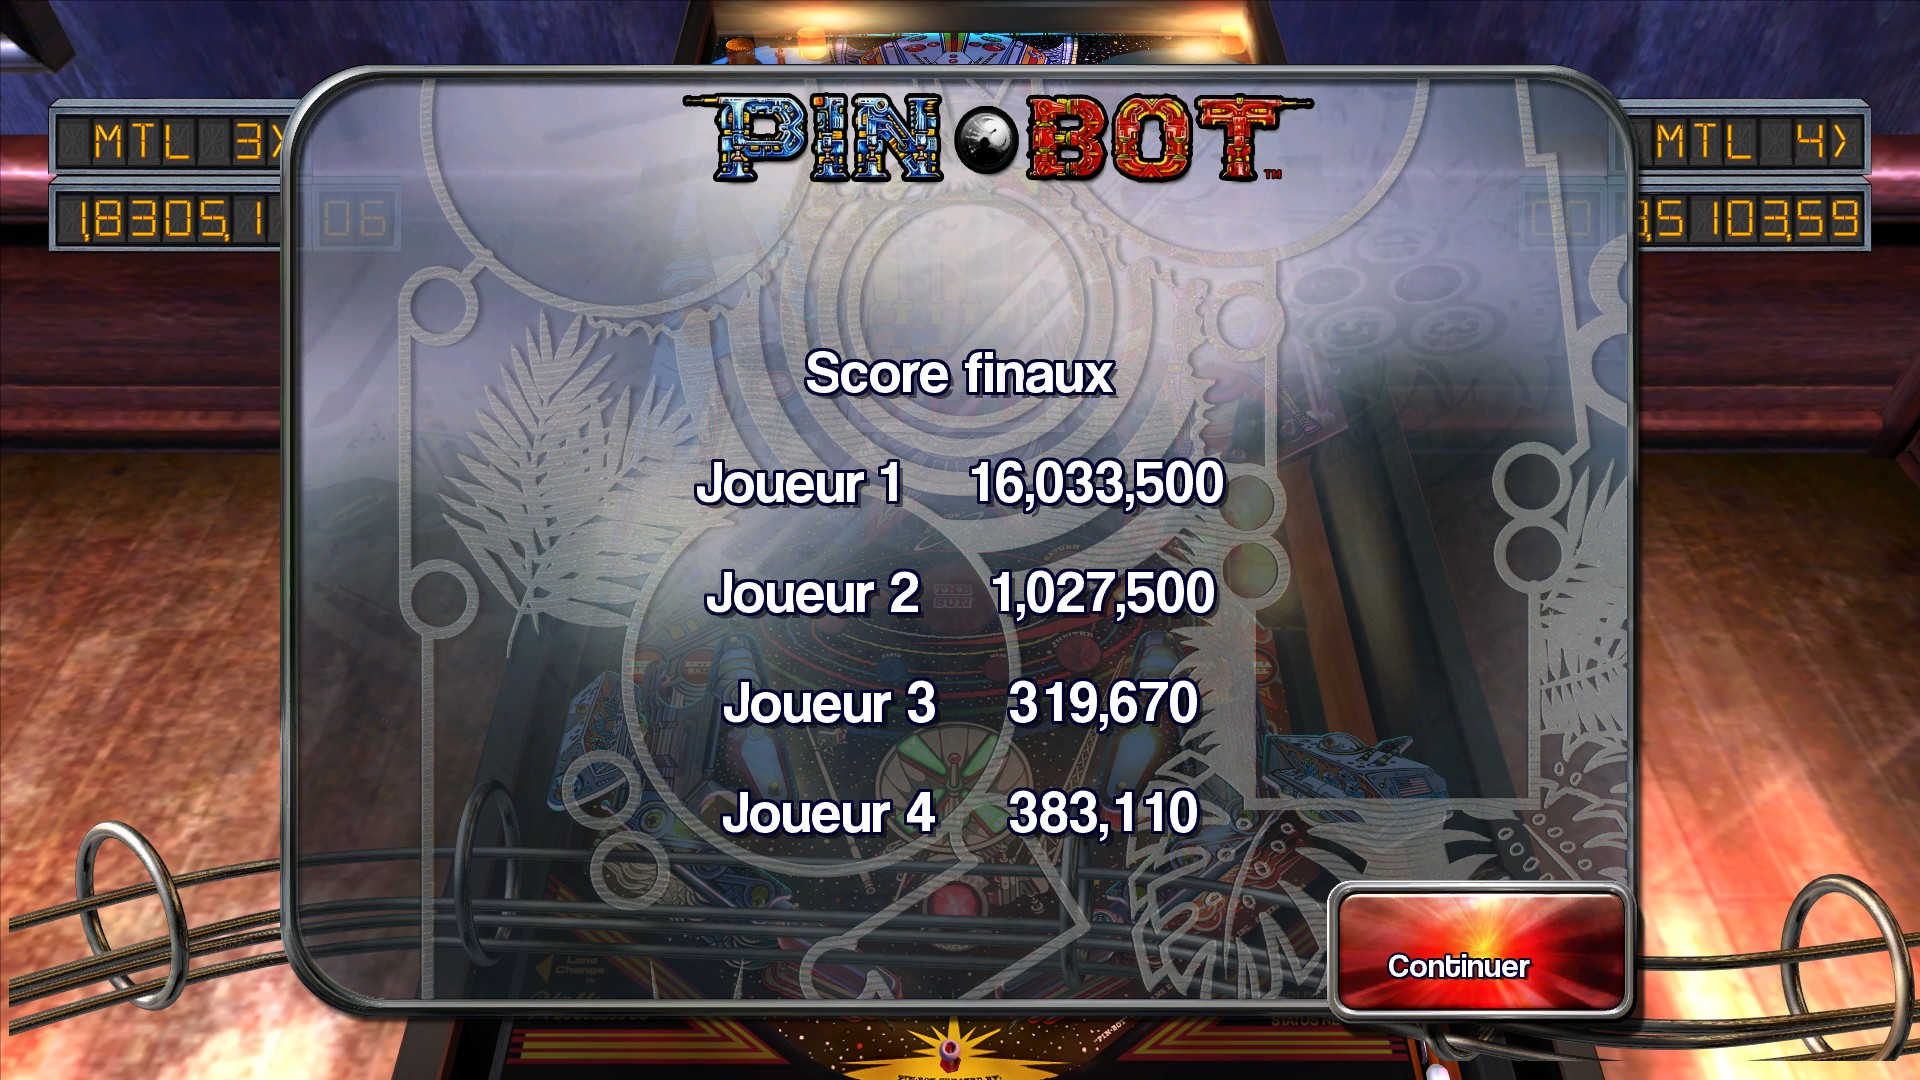 Mantalow: Pinball Arcade: Pin*Bot (PC) 16,033,500 points on 2015-08-24 04:19:05